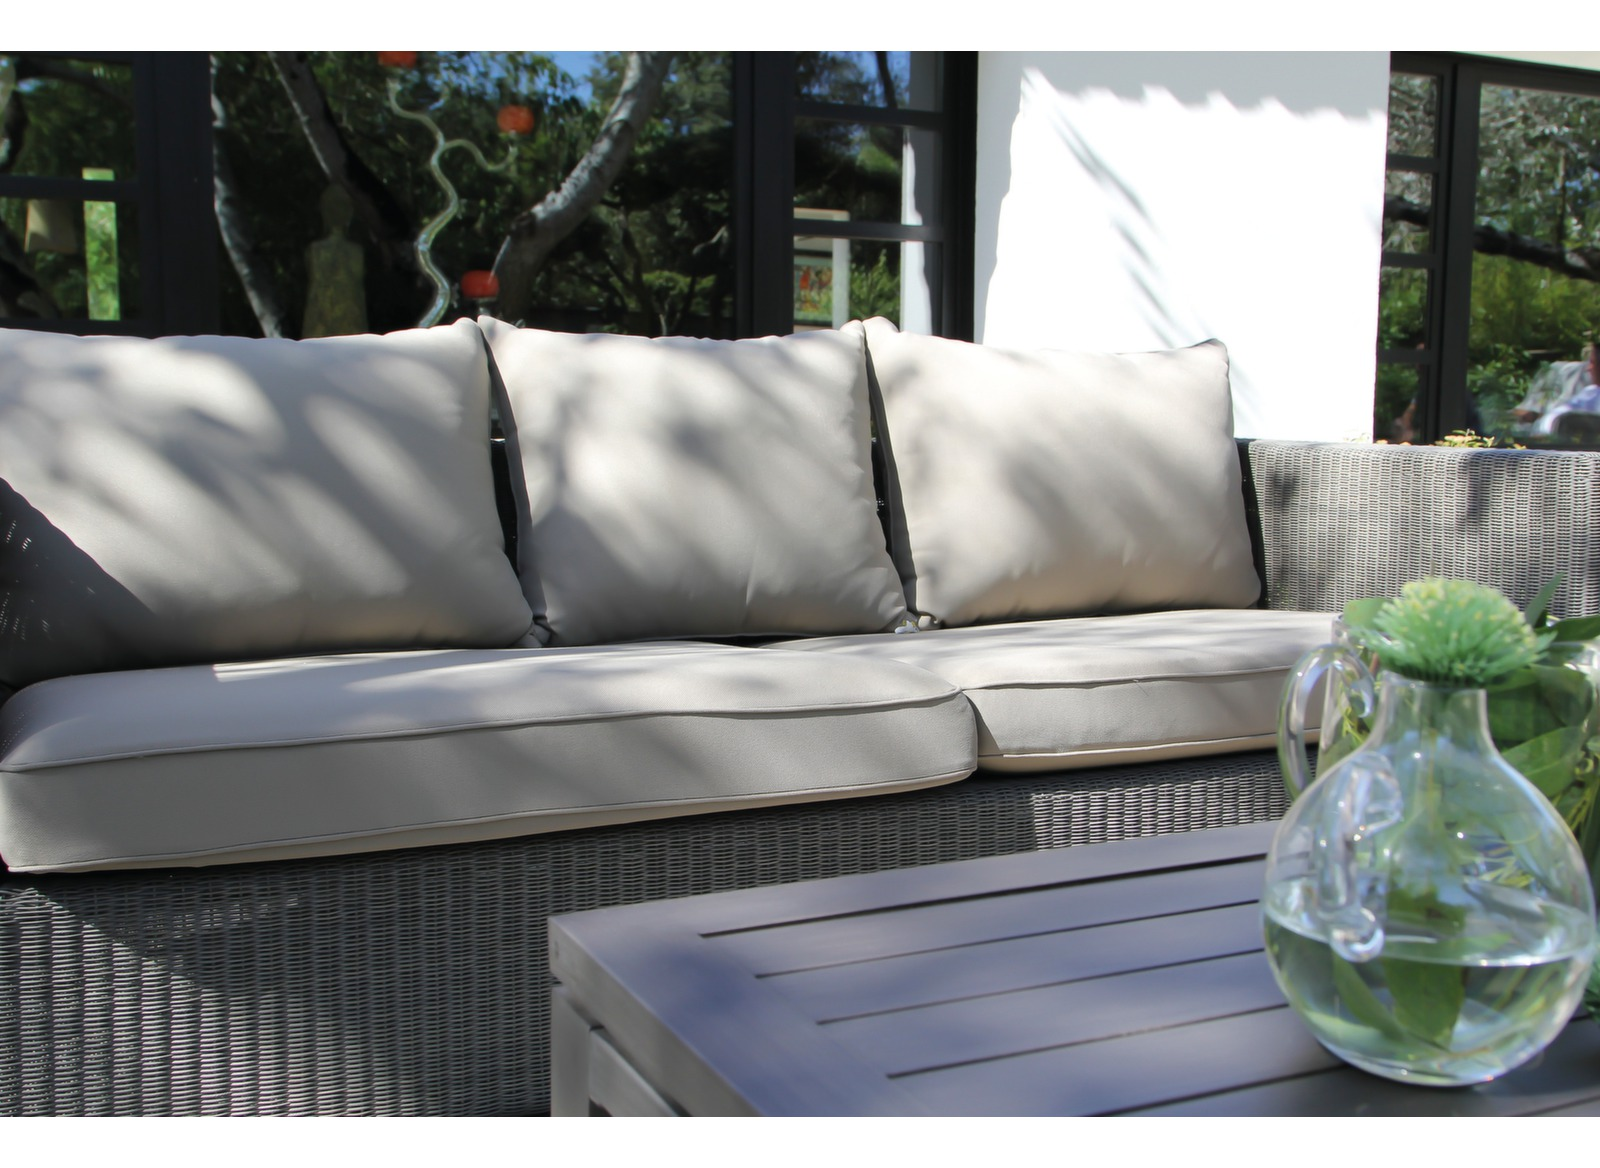 Canapé de jardin 3pl. résine tressée Meadow - Gamme Océo - Proloisirs 253b122fbff6